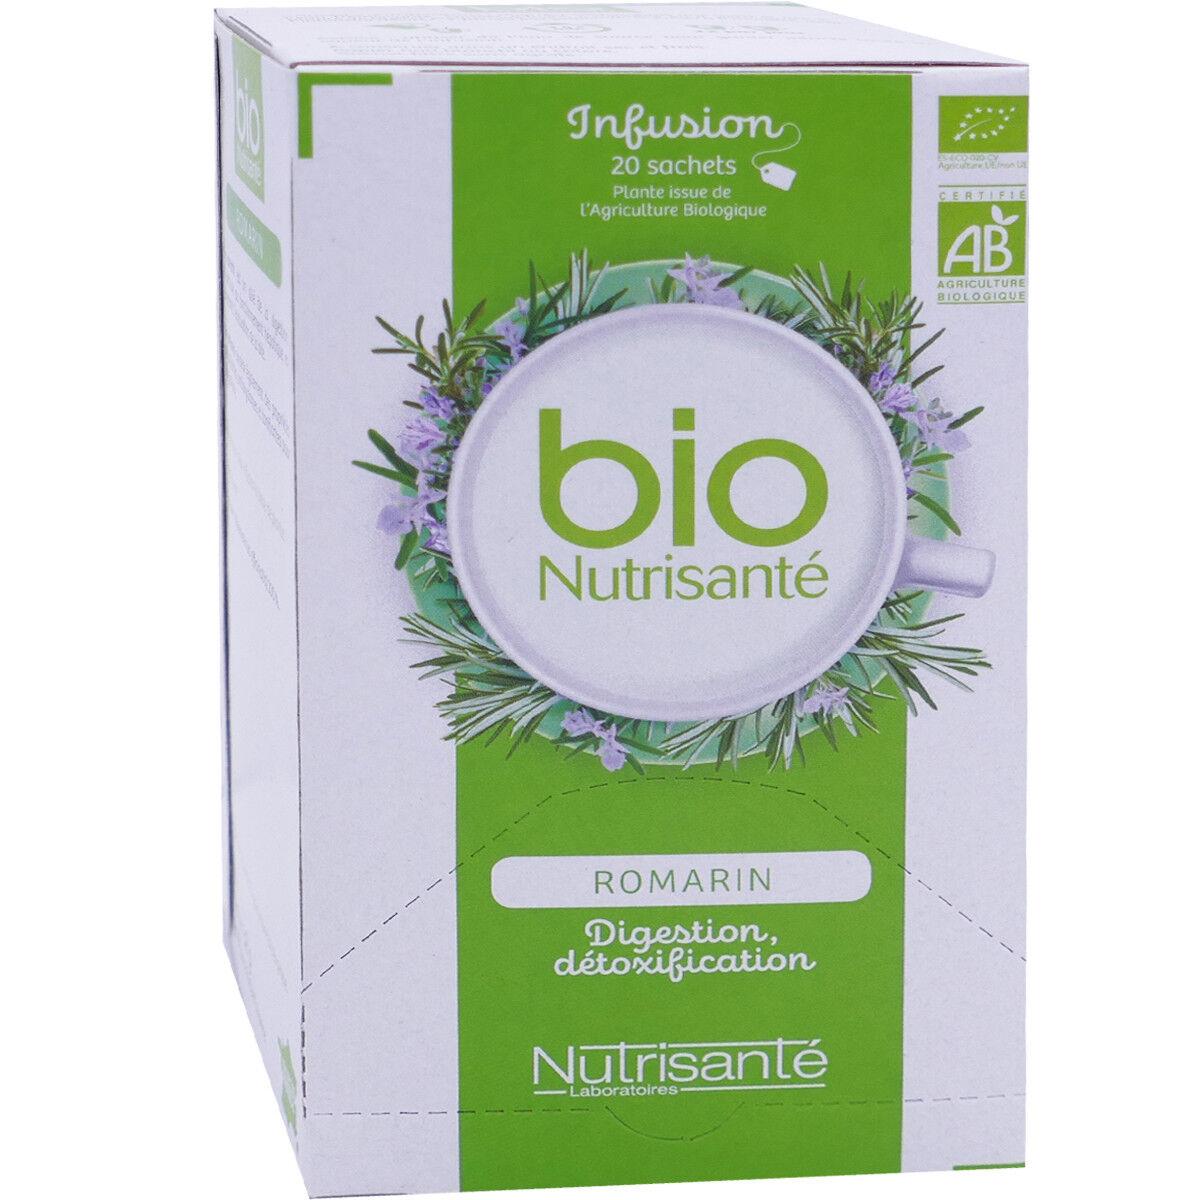 NUTRISANTE Bio nutrisante romarin digestion detoxification 20 sachets